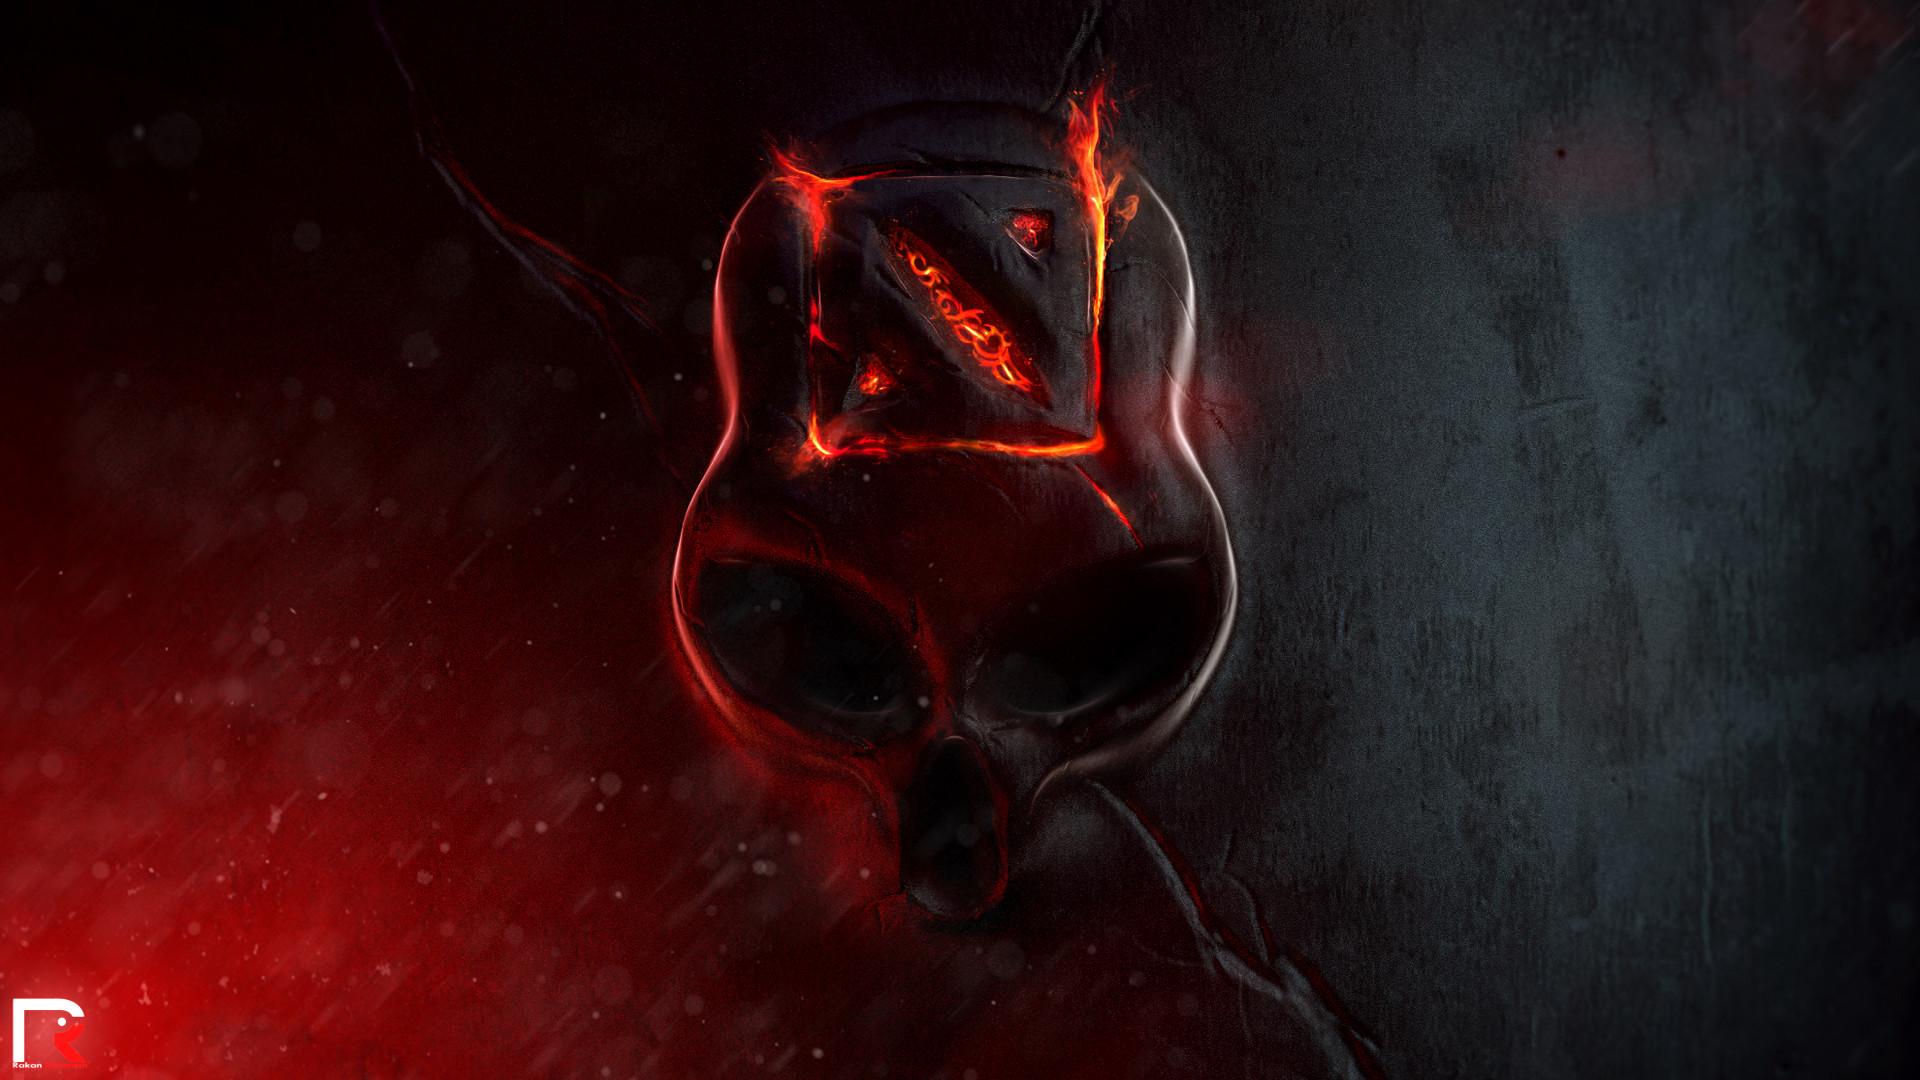 dota 2 logo flaming / fire skull game hd wallpaper , image , picture .